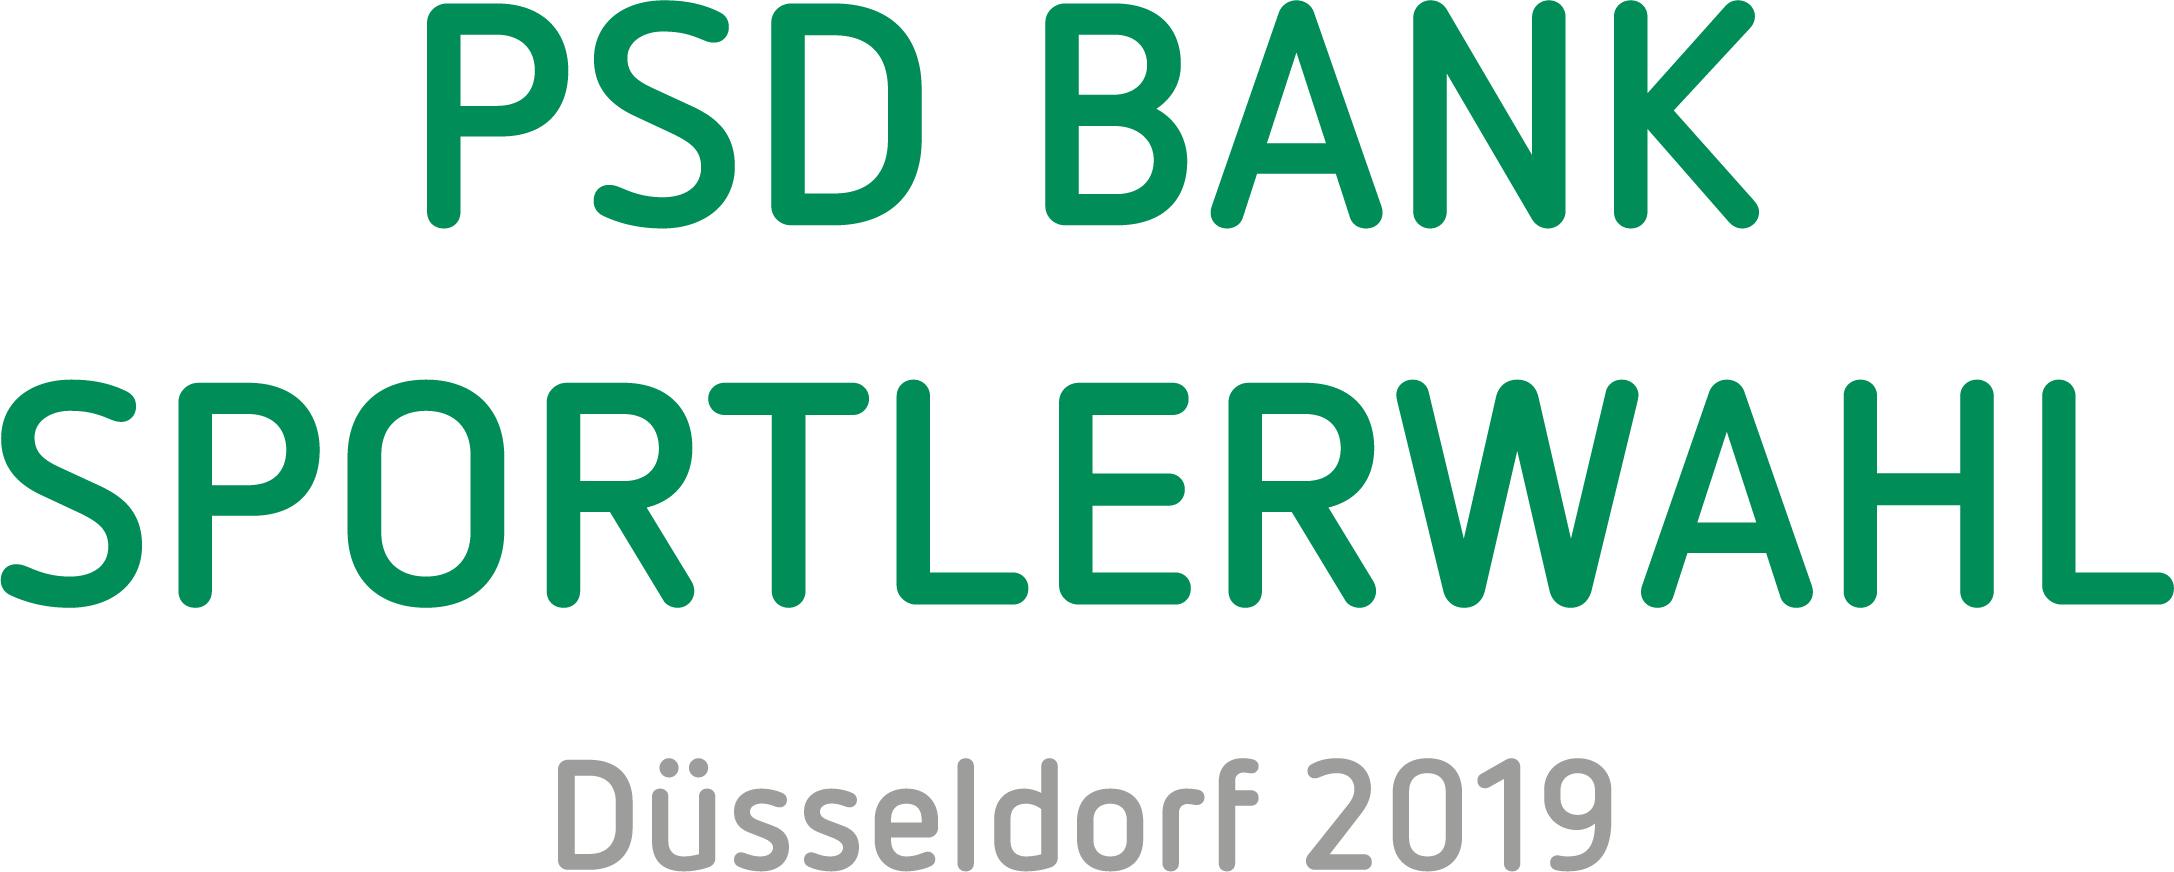 PSD Bank Sportlerwahl Düsseldorf 2019